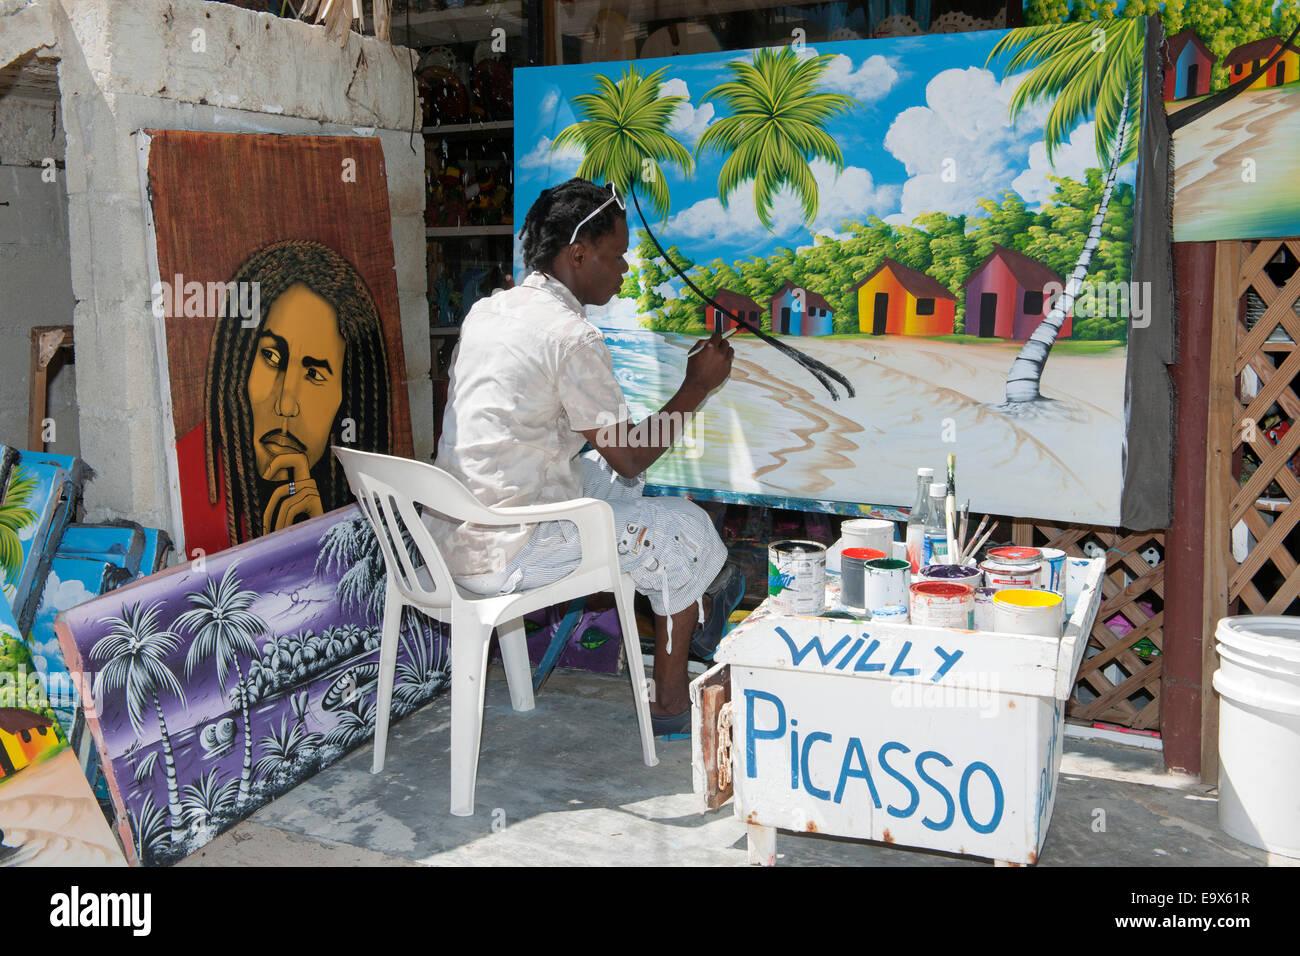 "Dominikanische Republik, Osteno, Punta Cana, Bavaro, Maler ""Willy Picasso' am Weg zum Strand von El Cortecito Immagini Stock"